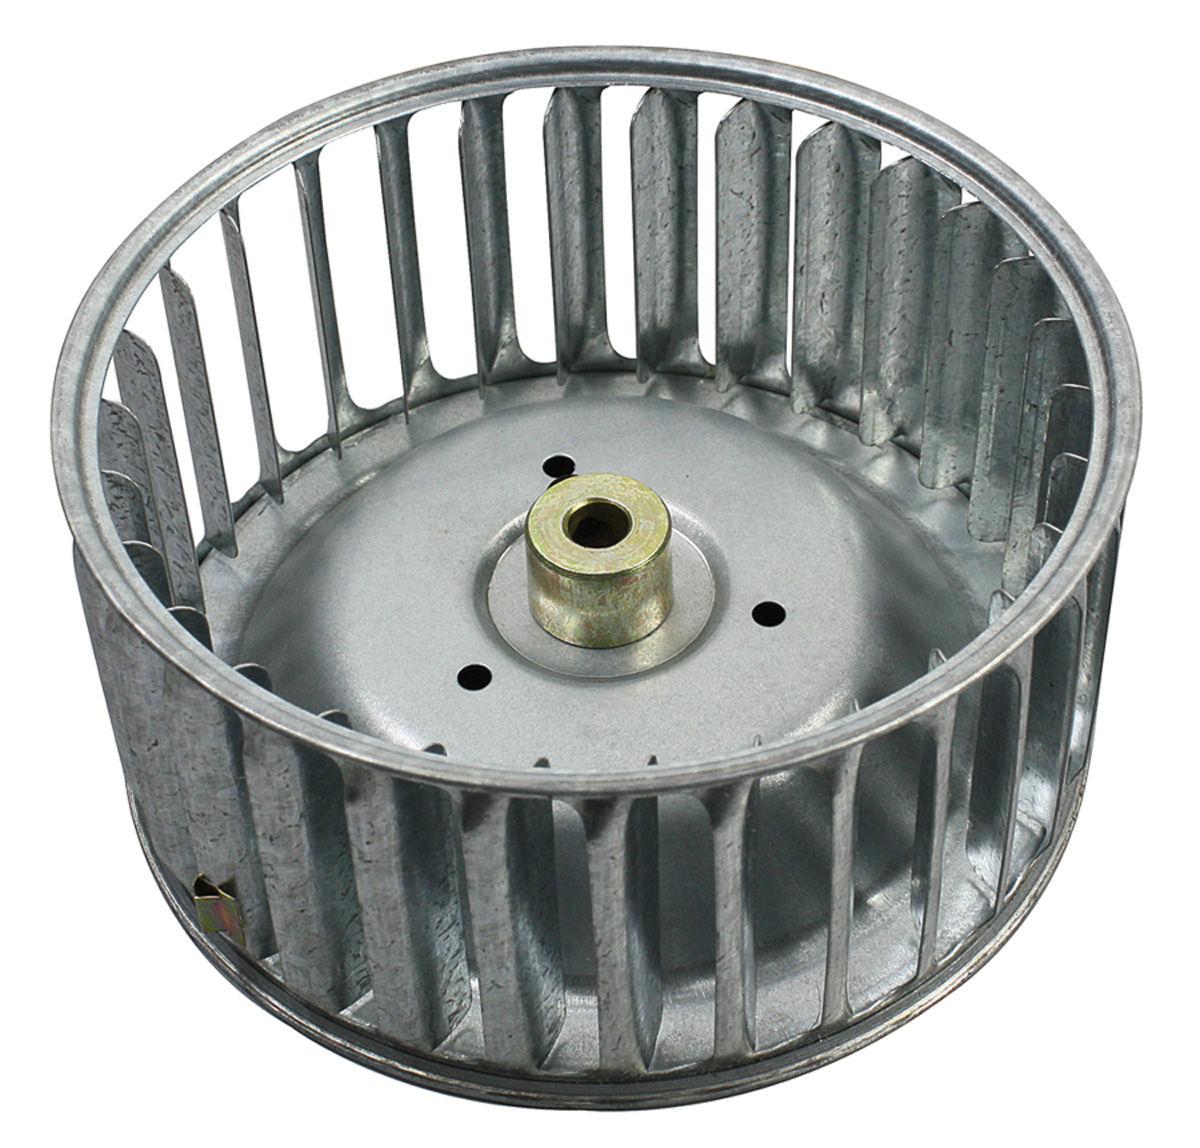 hight resolution of 1964 1977 chevelle blower motor fan